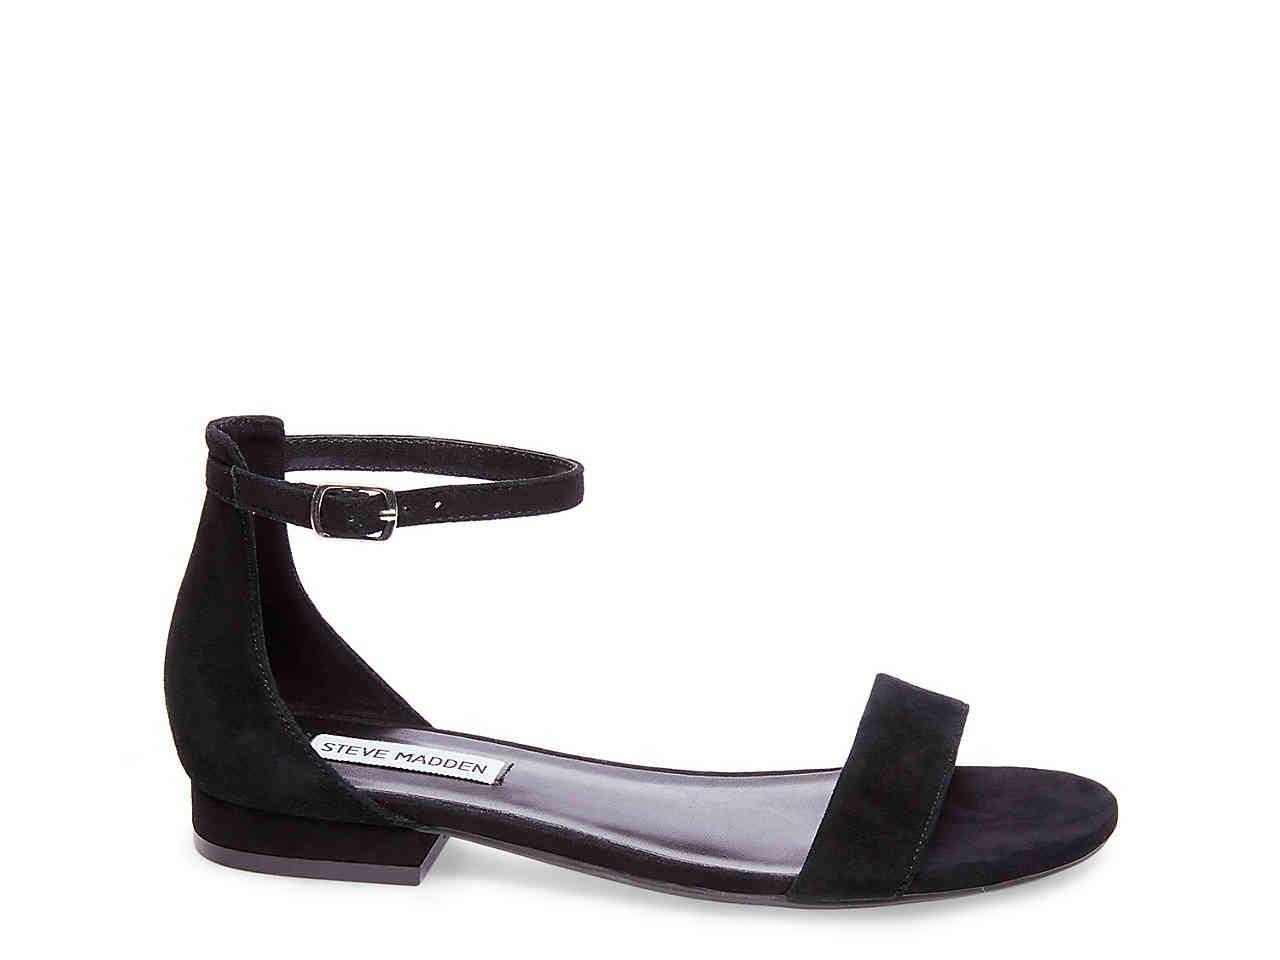 7a153b2a7b1 Lyst - Steve Madden Lamp Flat Sandal in Black